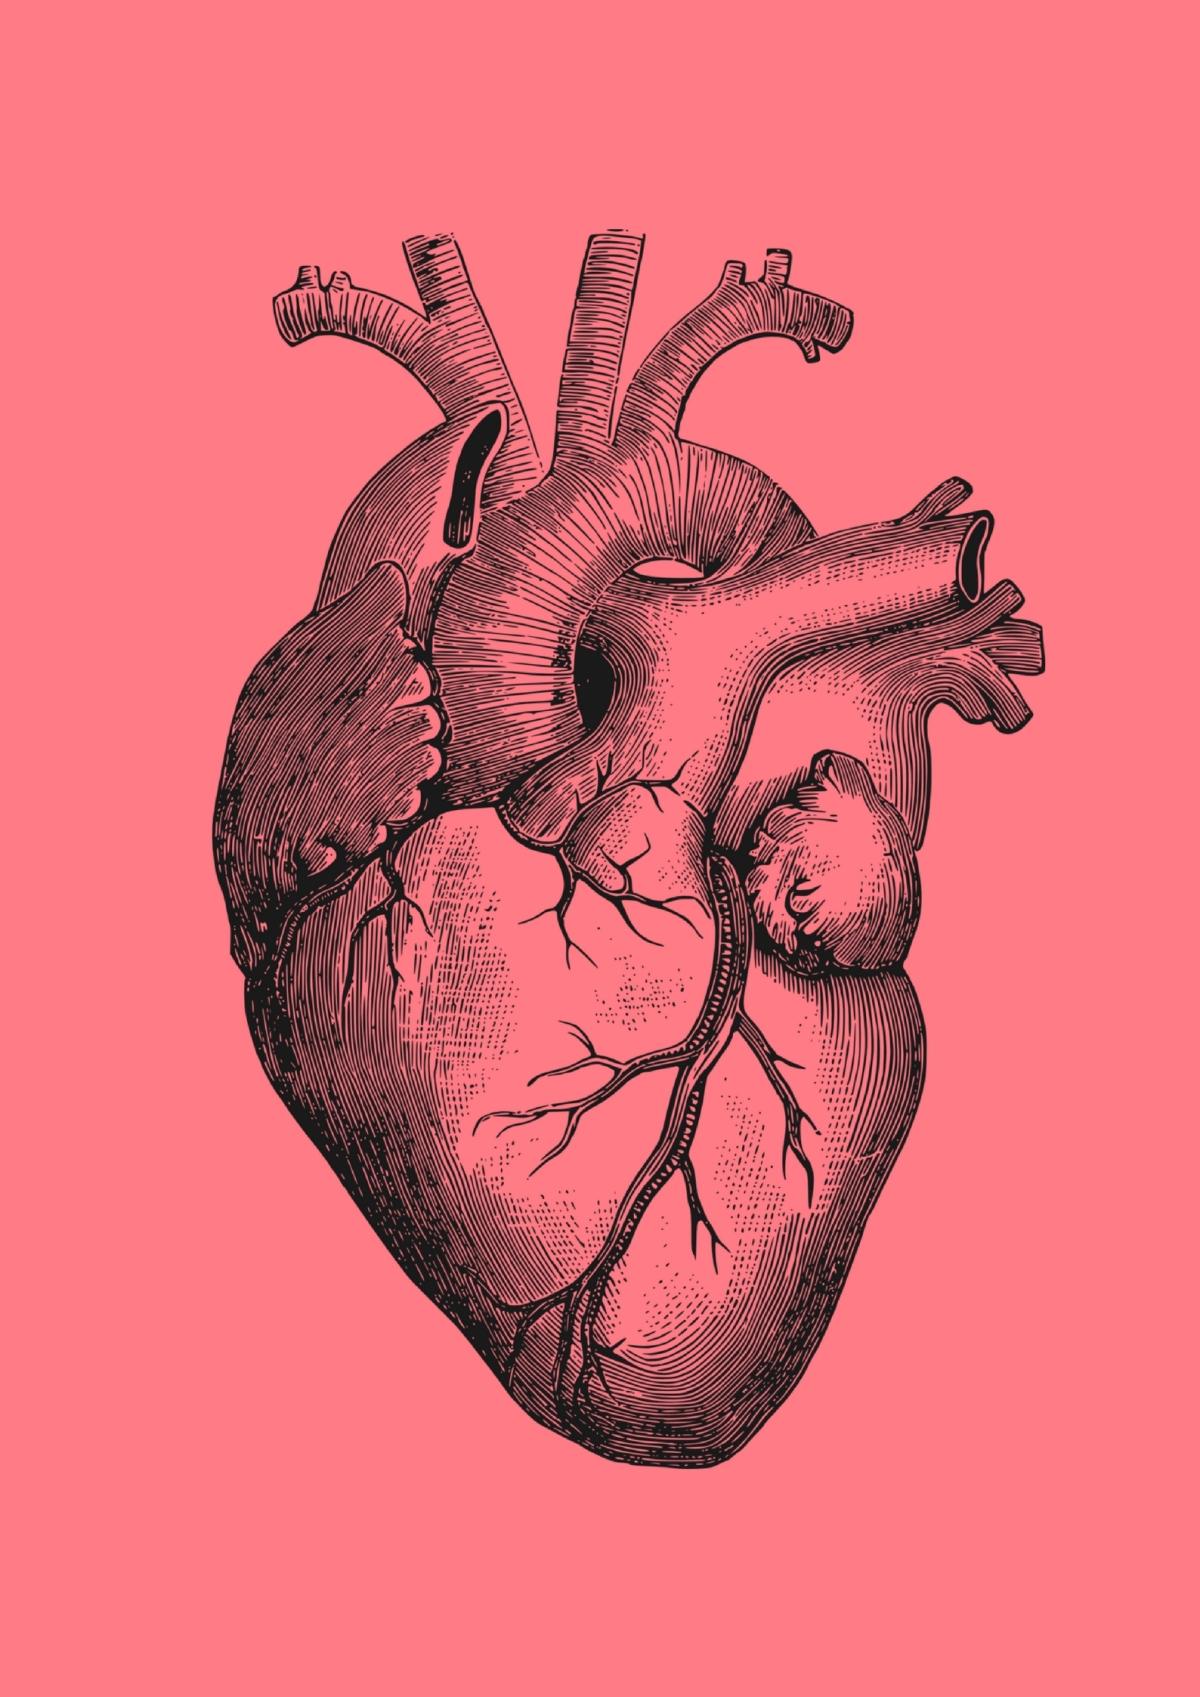 The_Heart_of_Yoga.jpg